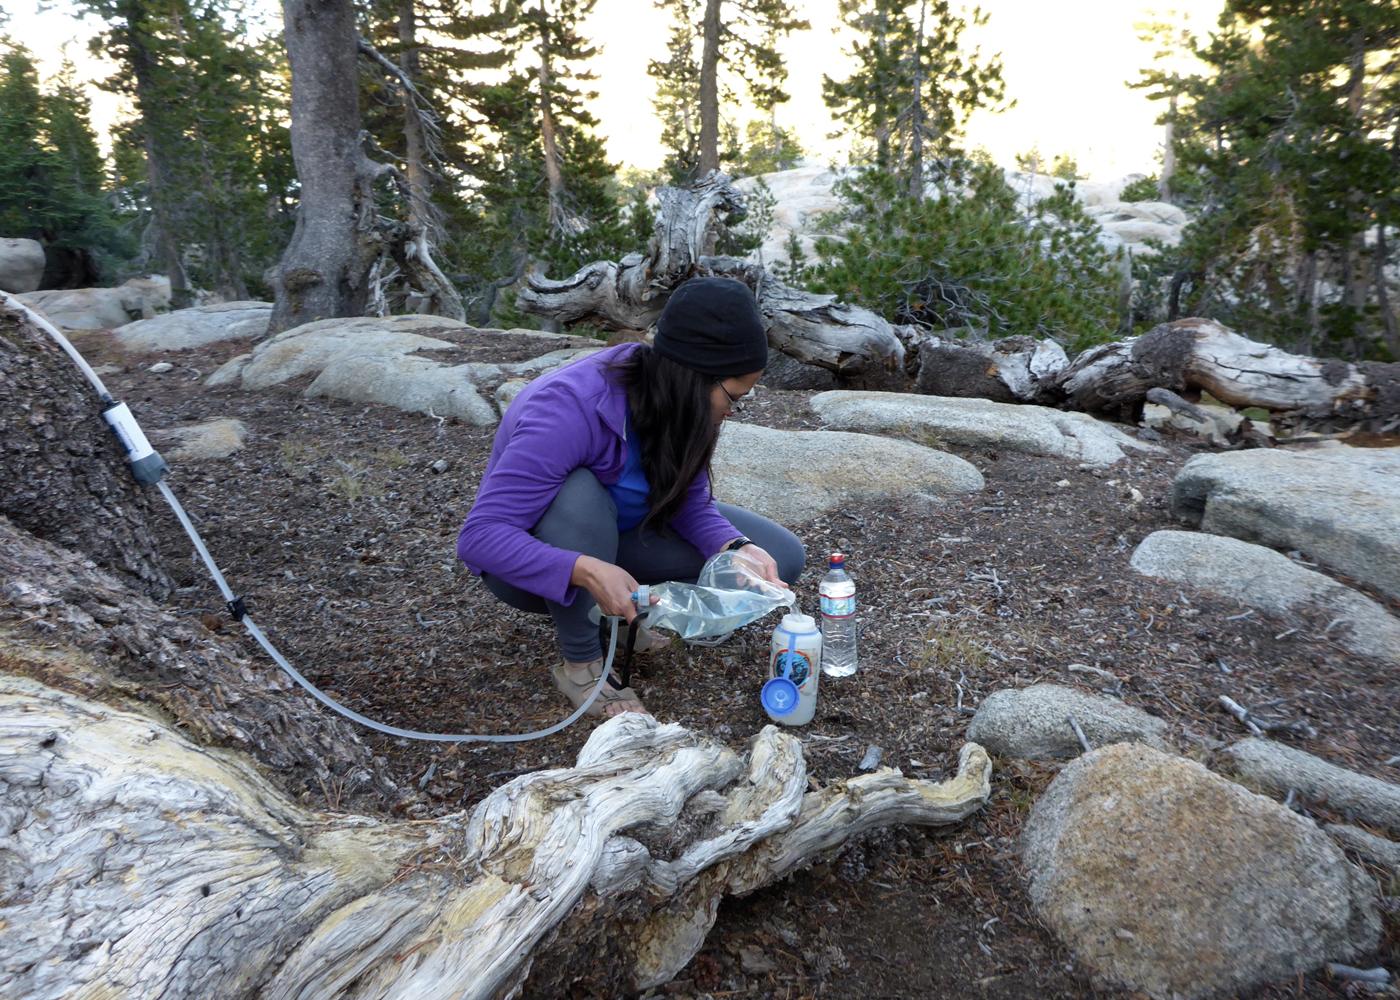 Release Of Liability Ca >> Backpack for women: Yosemite National Park, CA – Sierra Club